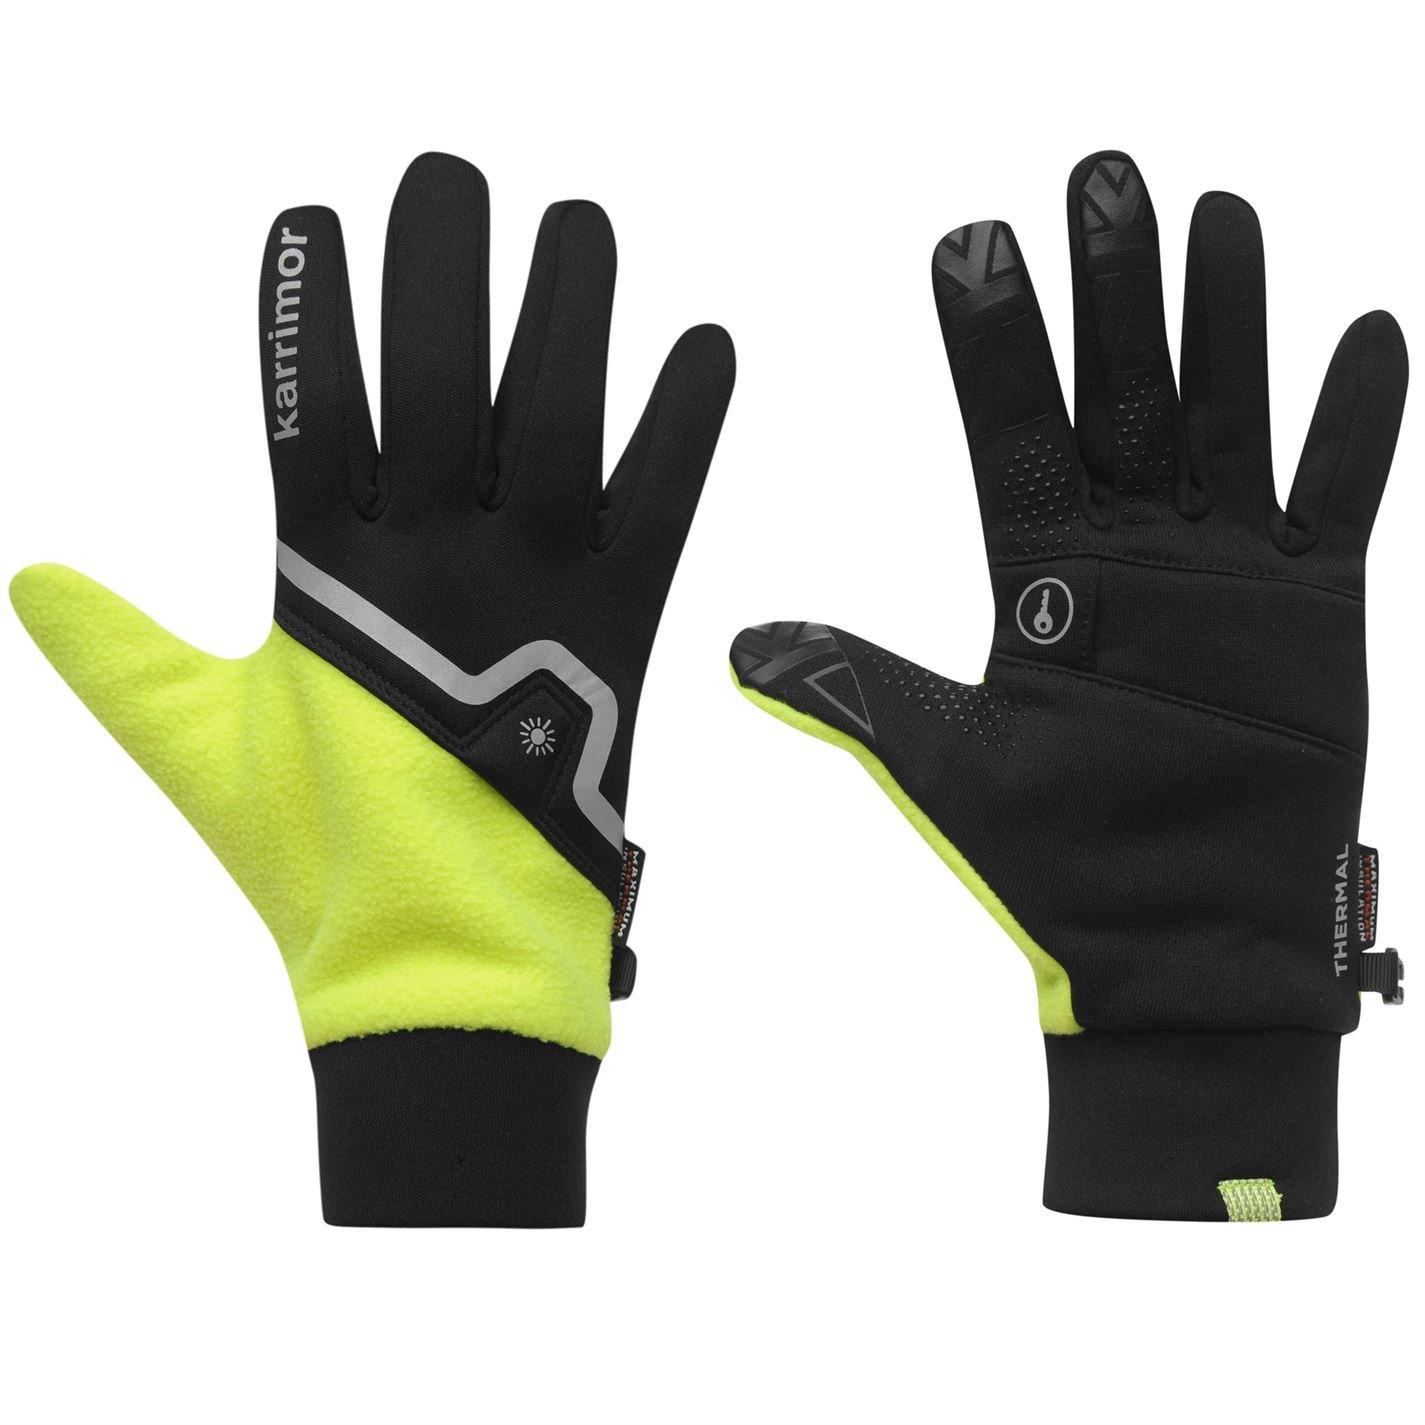 Ron Hill Classic Gloves Mens Gents Lightweight Warm Moisture Wicking